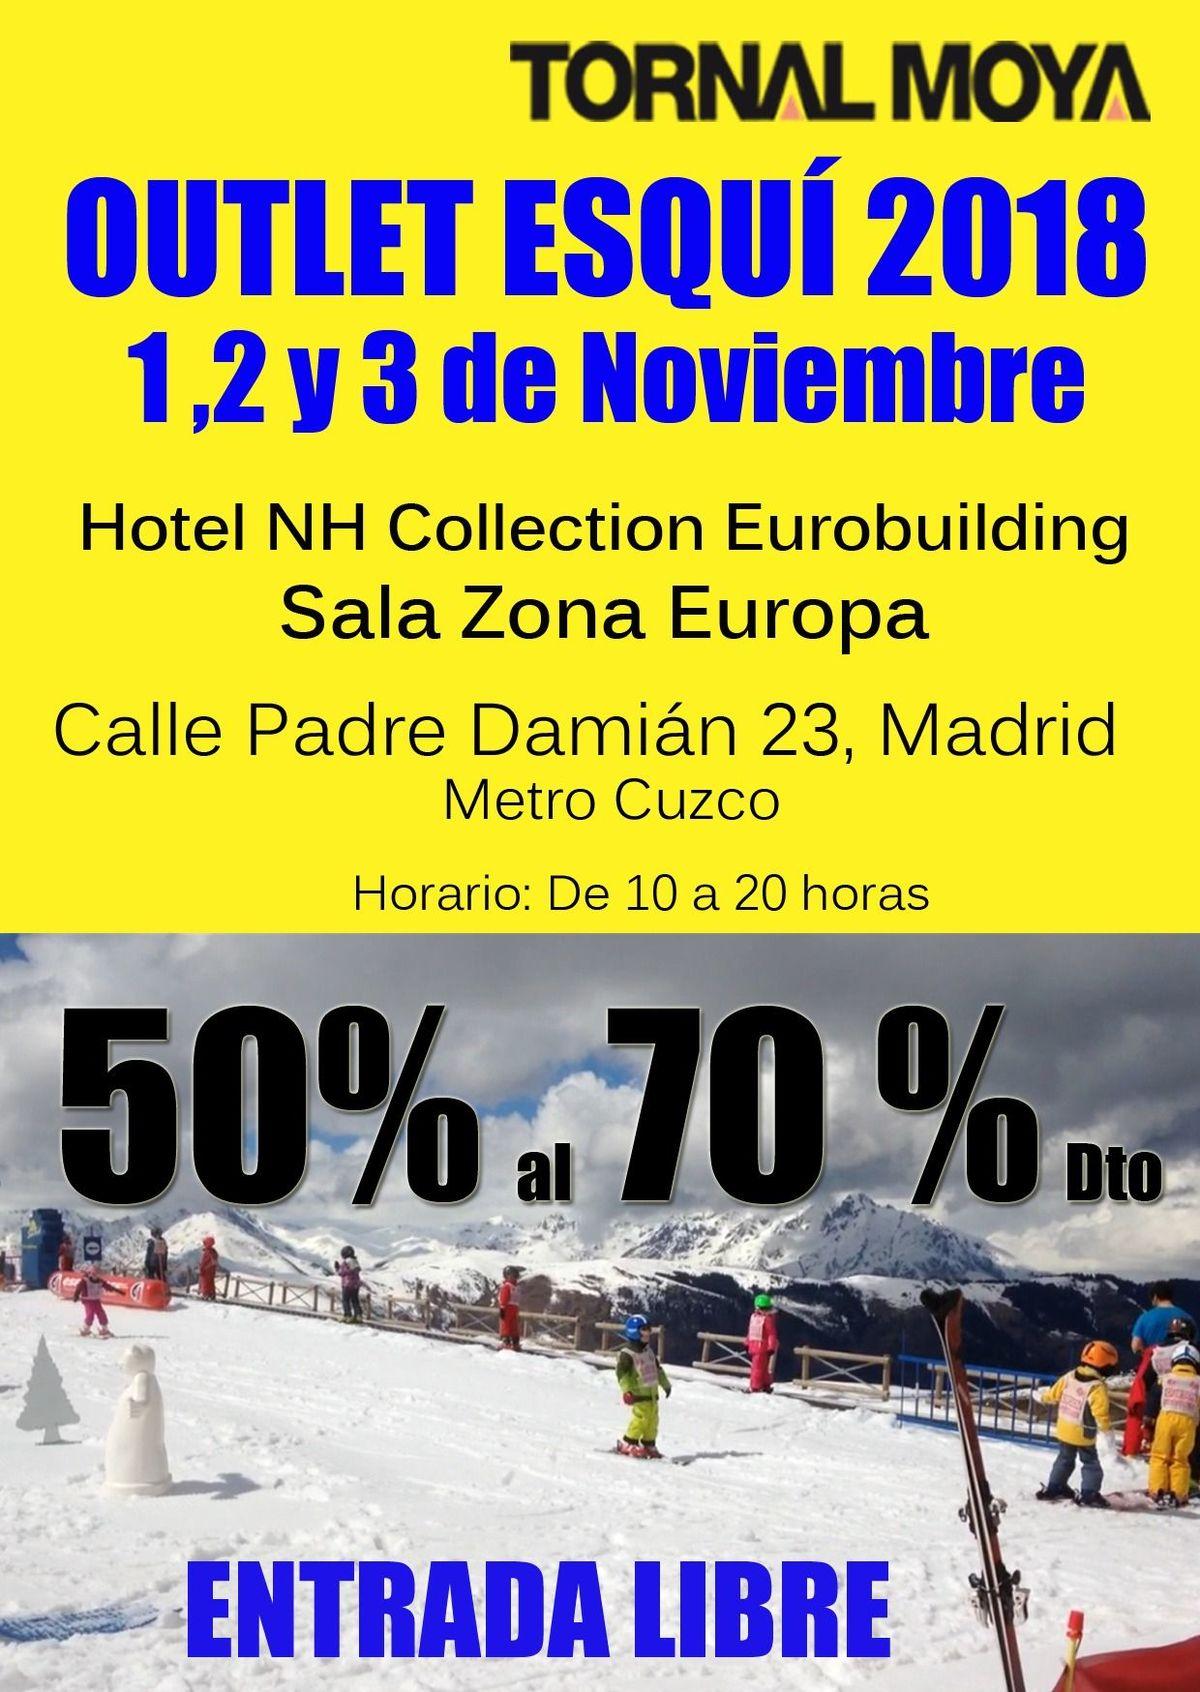 7ddbb4bd3c7 Lugar  Hotel NH Collection Eurobuilding Dirección  Calle Padre Damián 23 -  Madrid Salón  Zona Europa Fecha  1